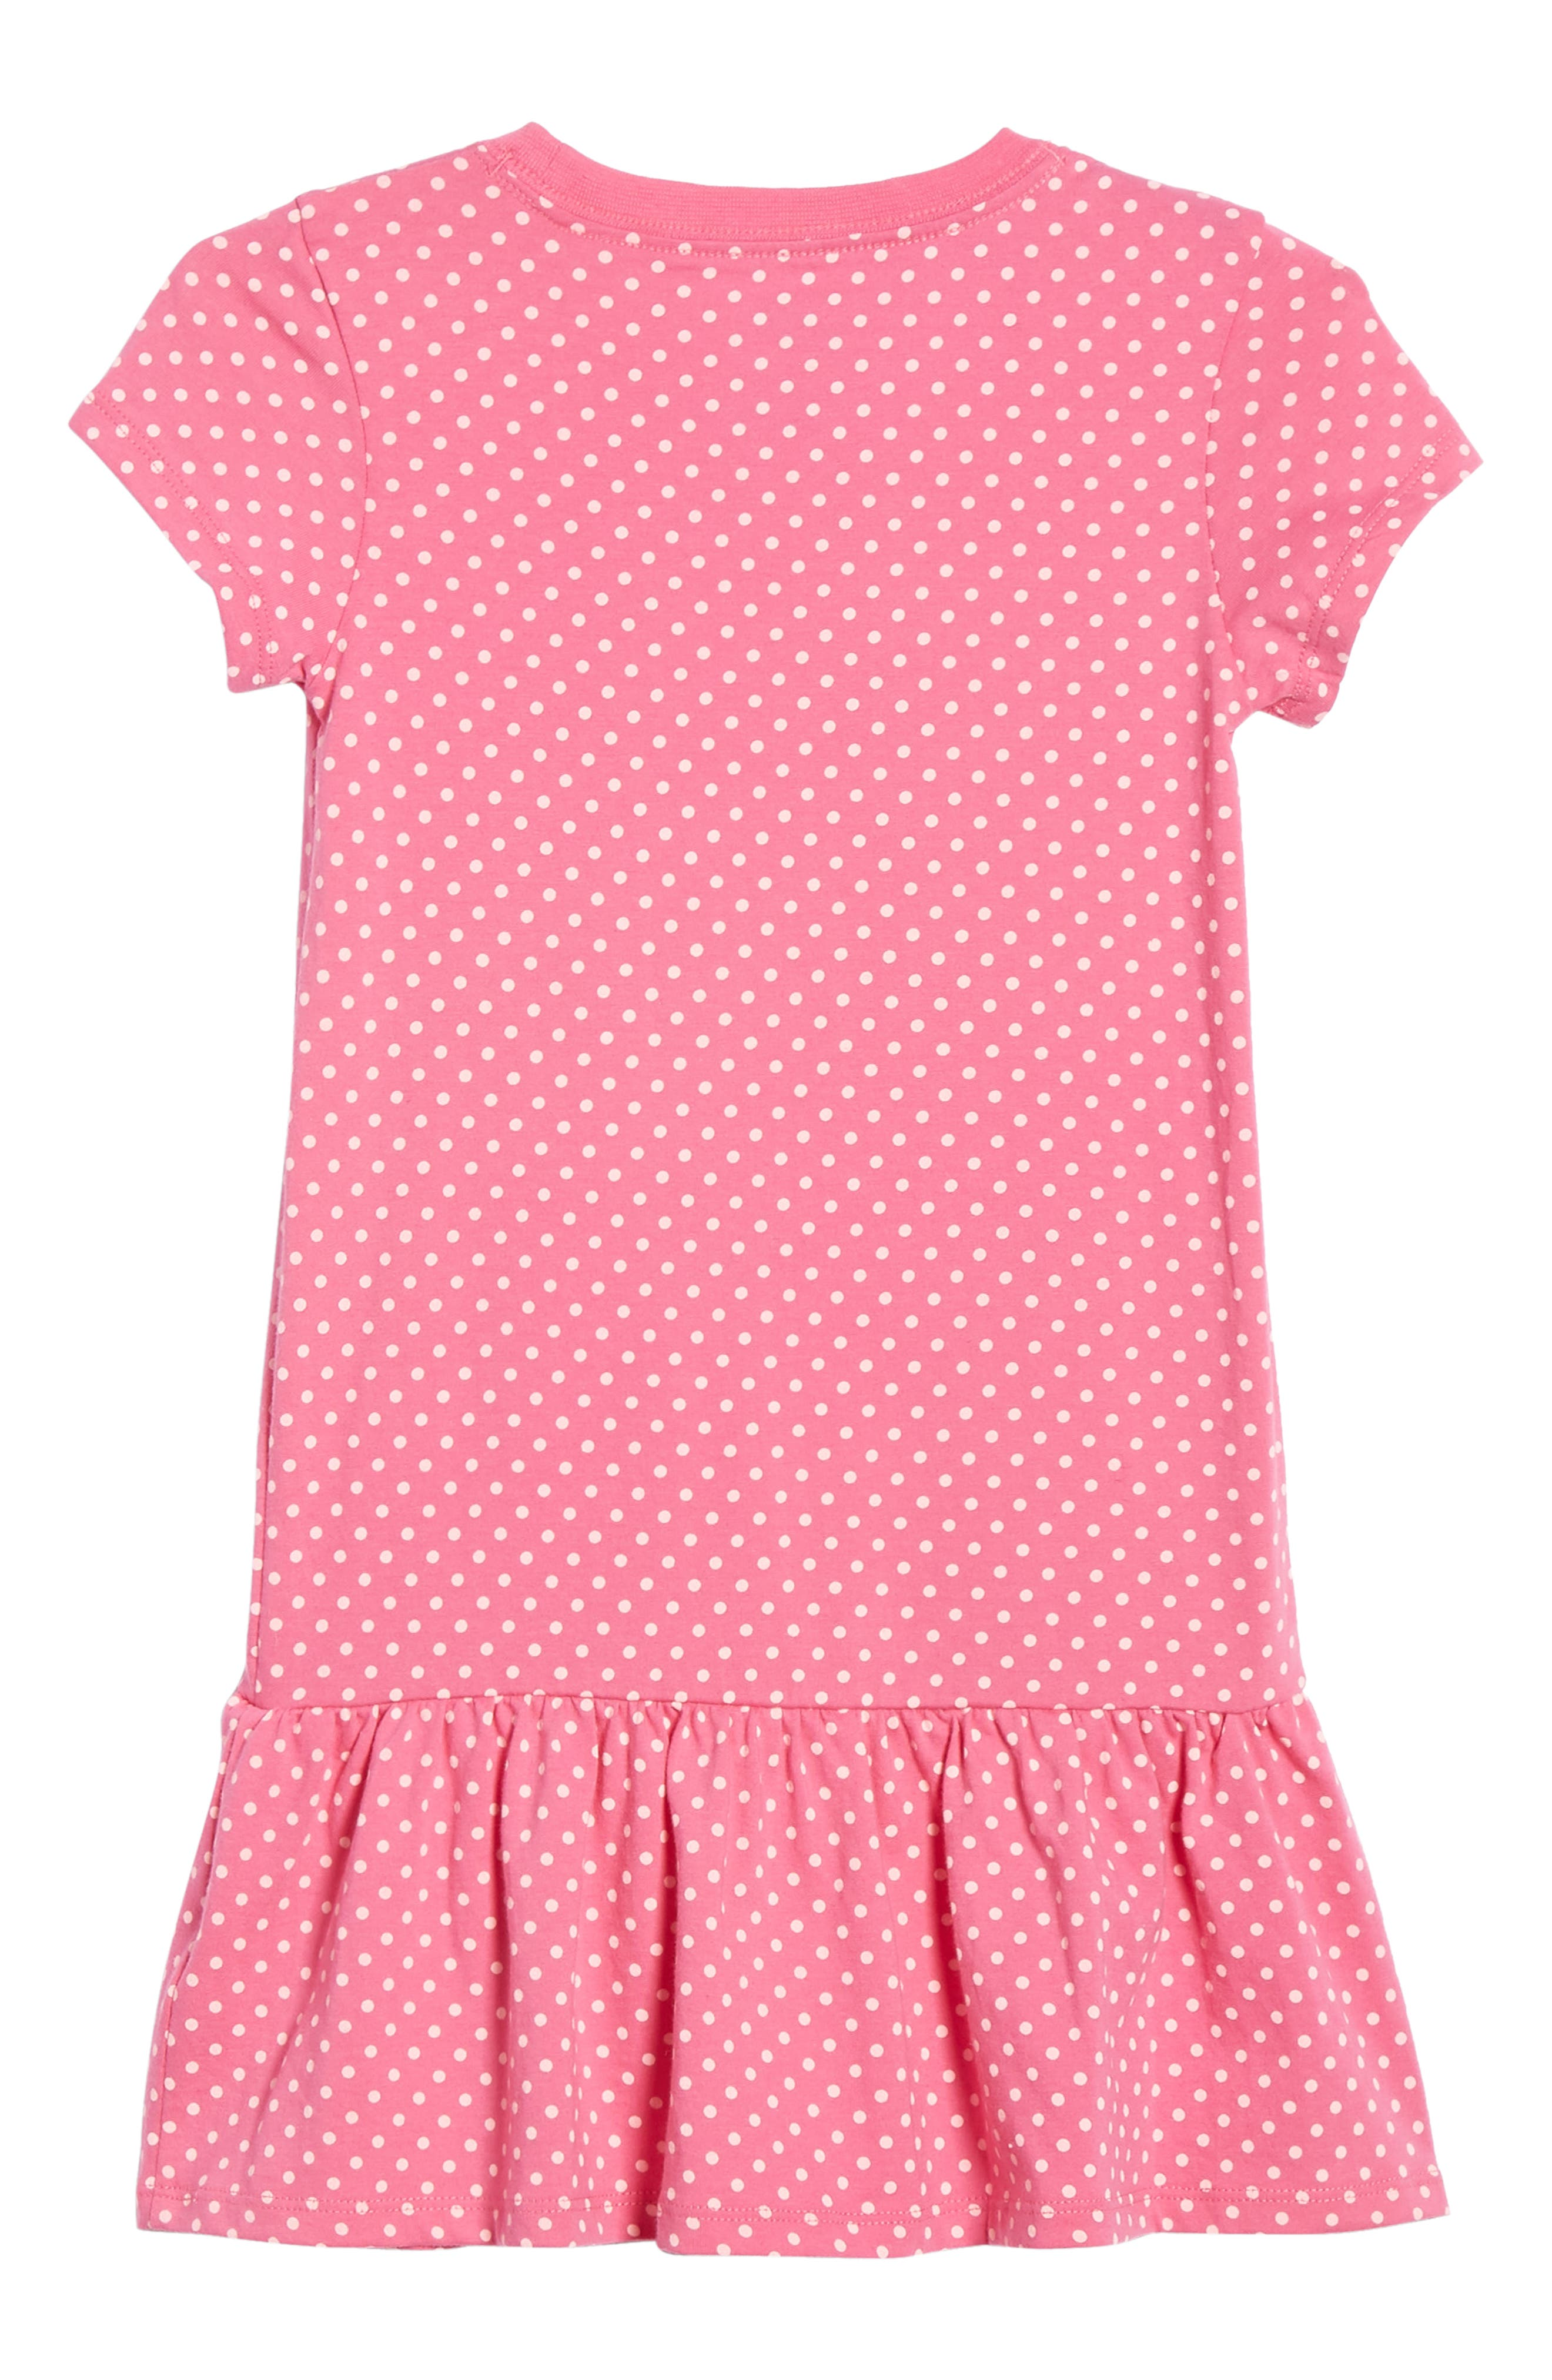 NIKE,                             Polka Dot Drop Waist Dress,                             Alternate thumbnail 2, color,                             LASER FUSCHIA